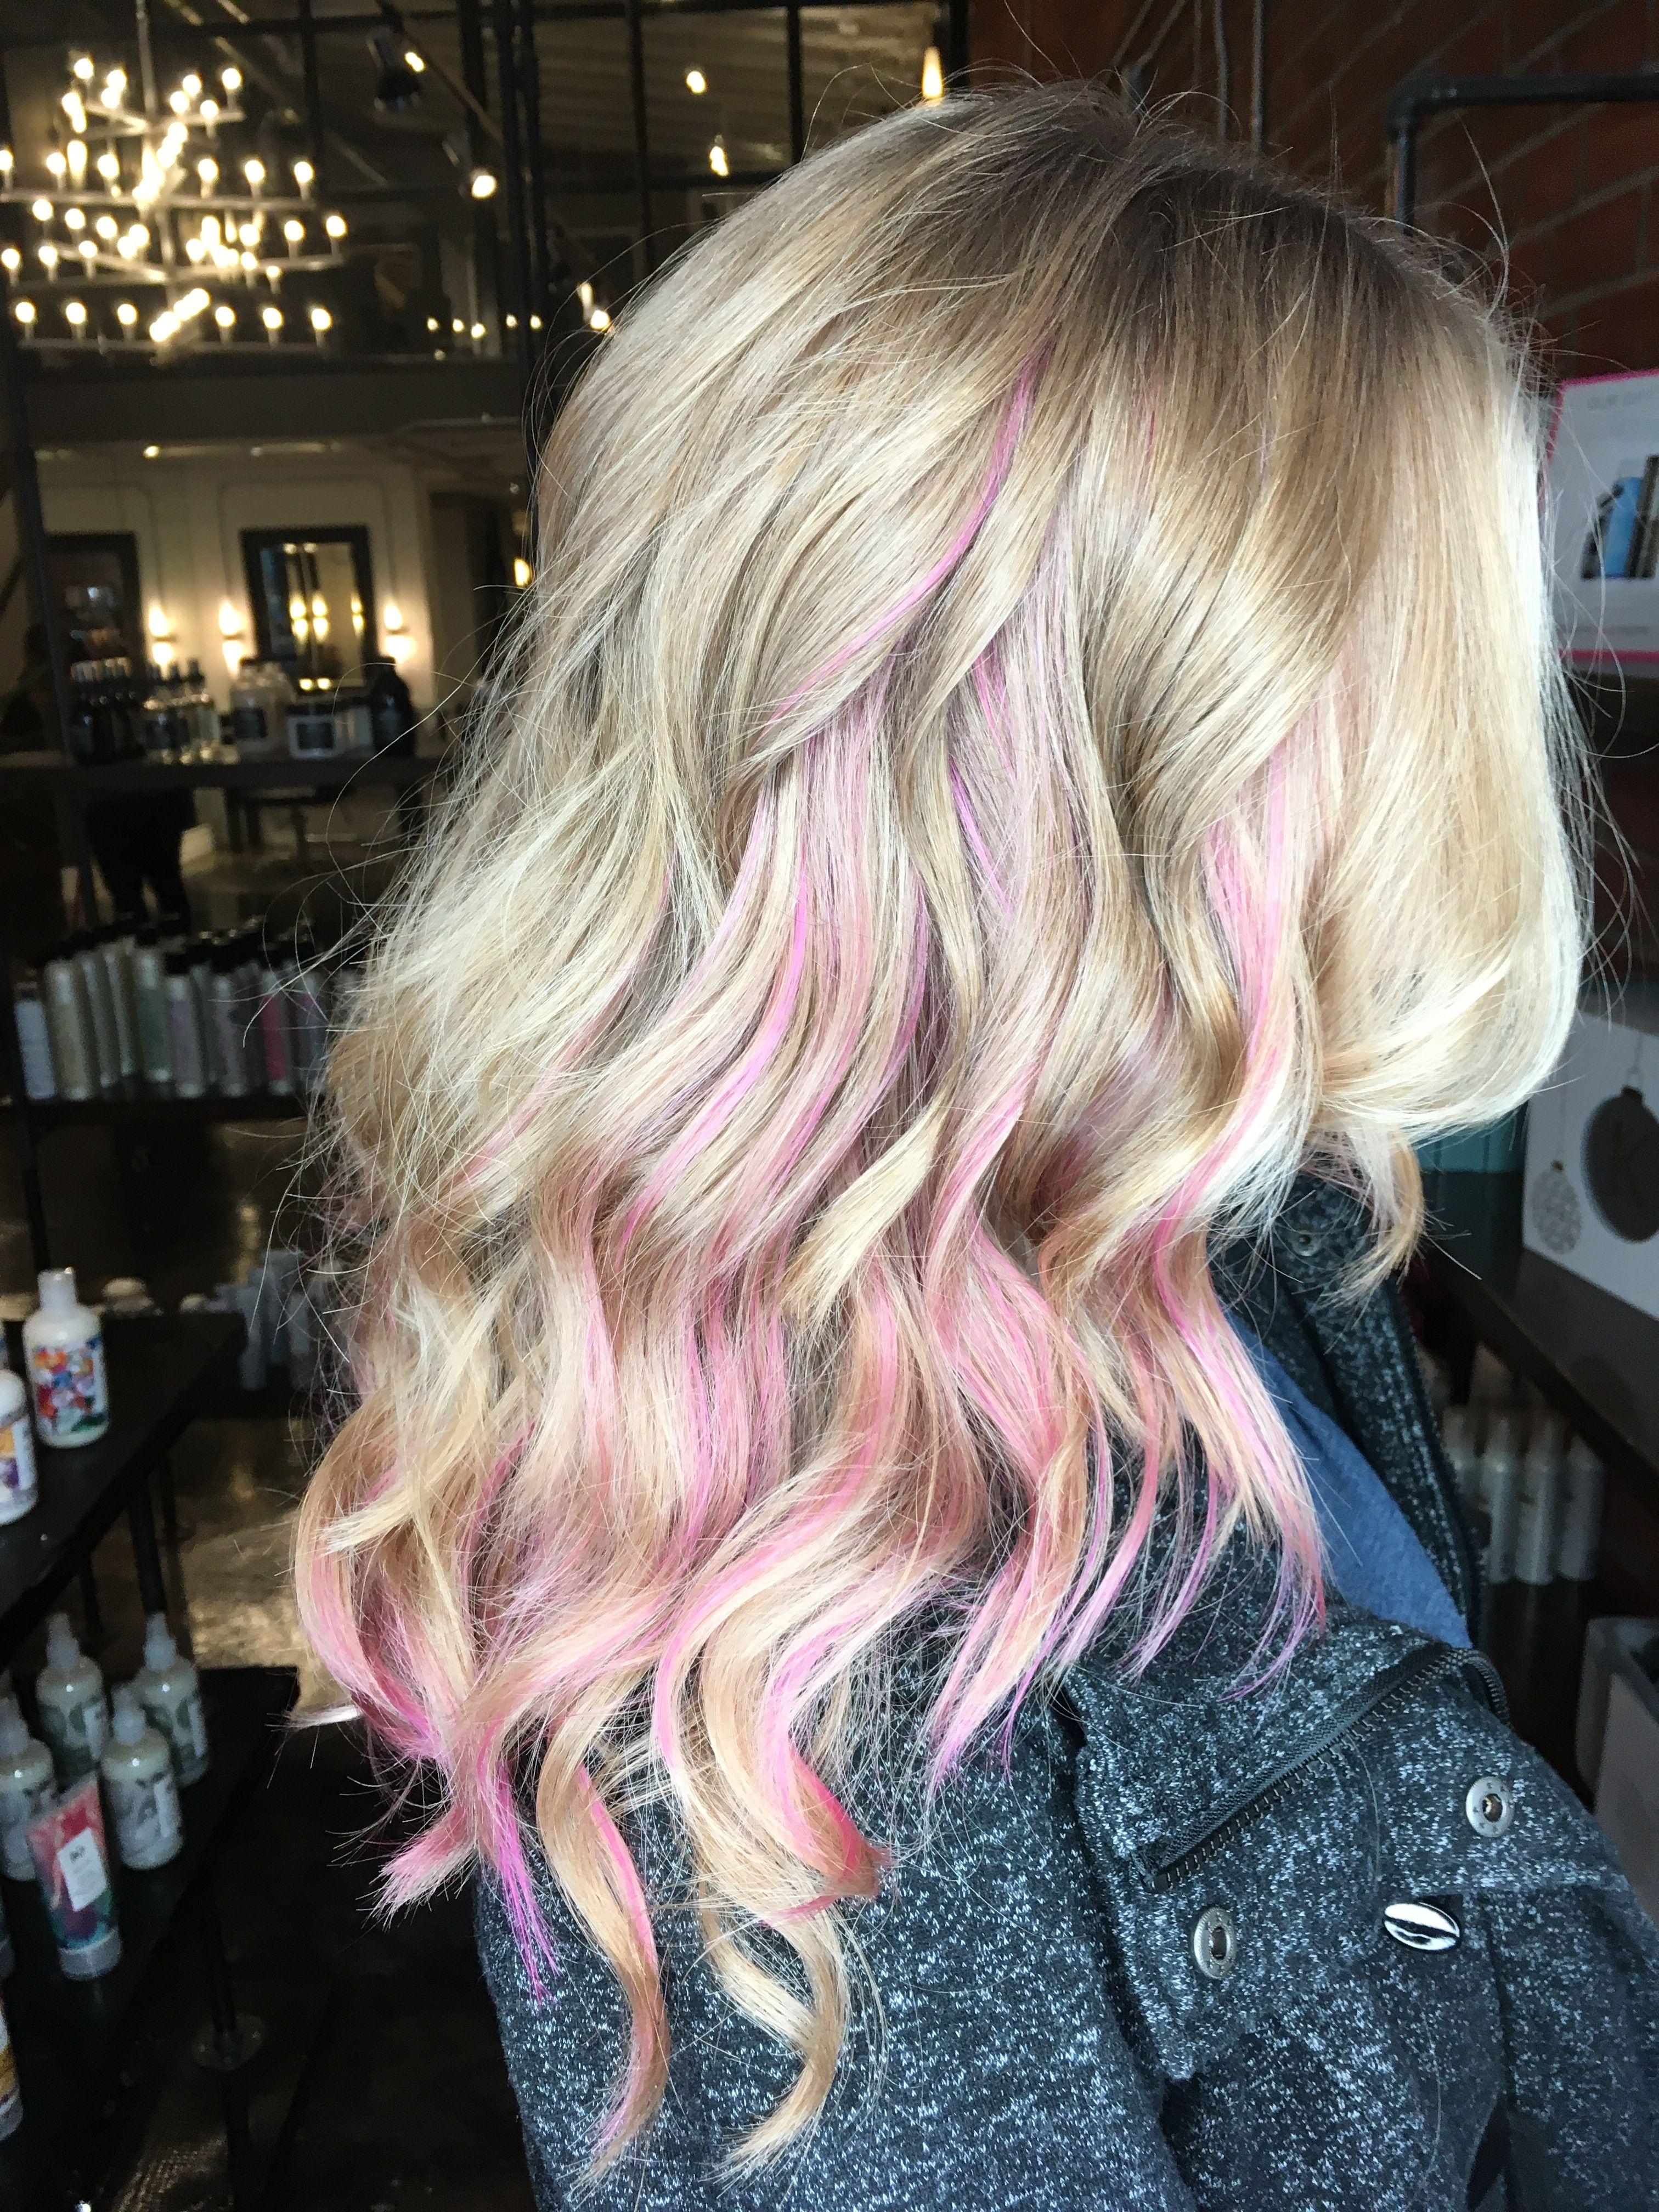 pink peekaboo highlights in natural blonde hair Hair